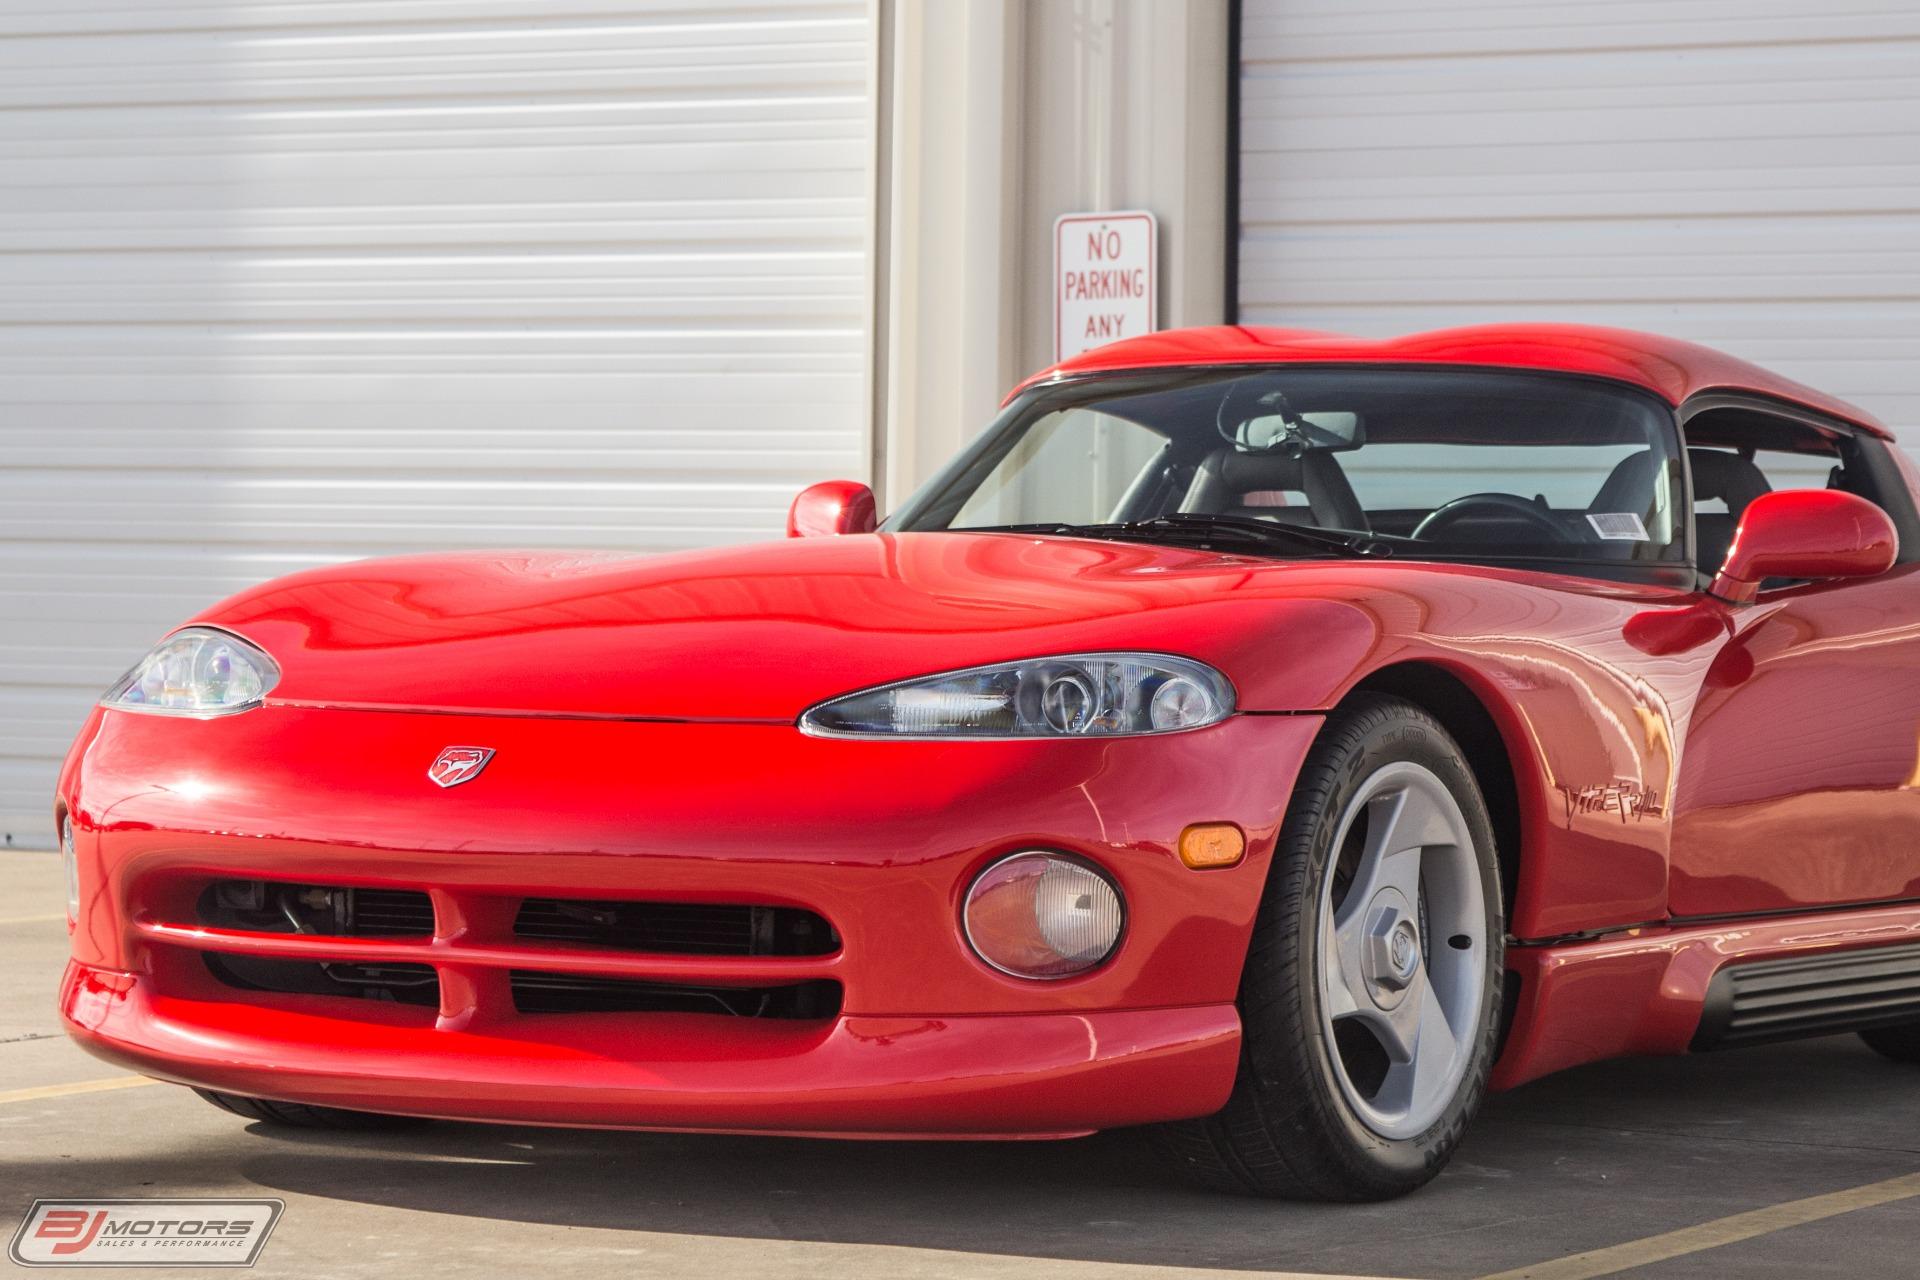 Used-1992-Dodge-Viper-2K-Miles-AC-Hardtop-RT/10